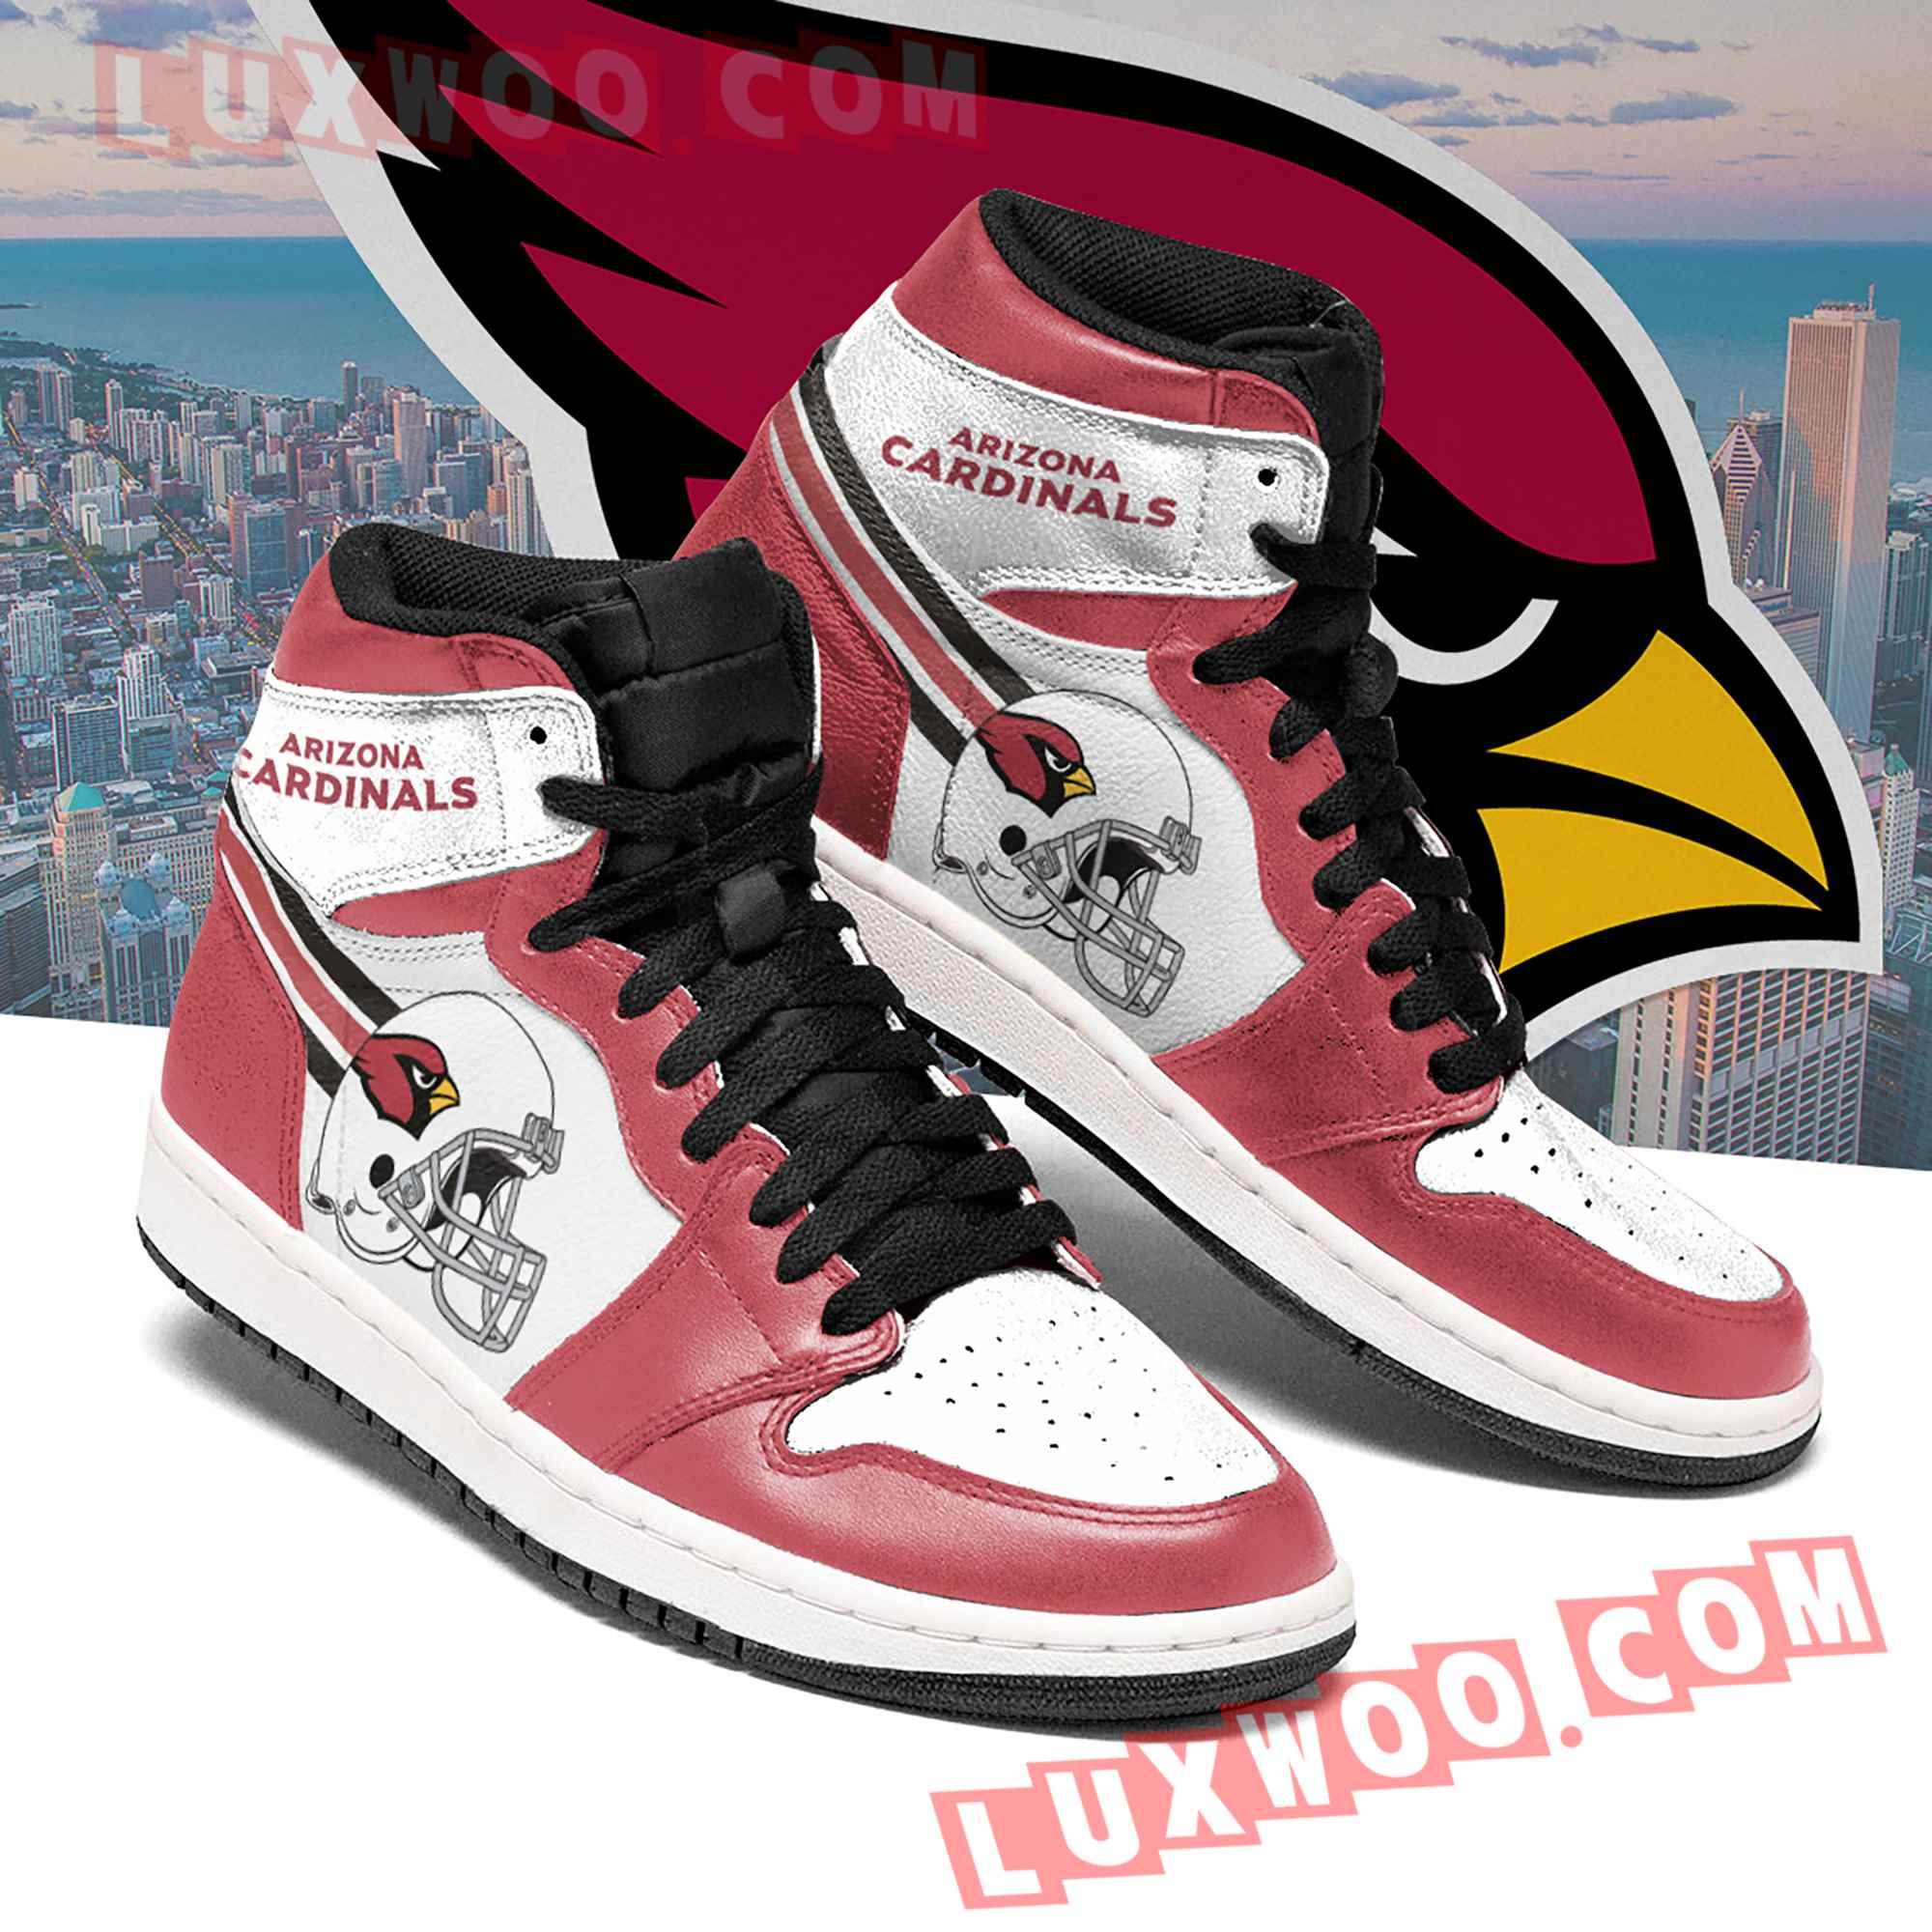 Arizona Cardinals Nfl Air Jordan 1 Custom Shoes Sneaker V6